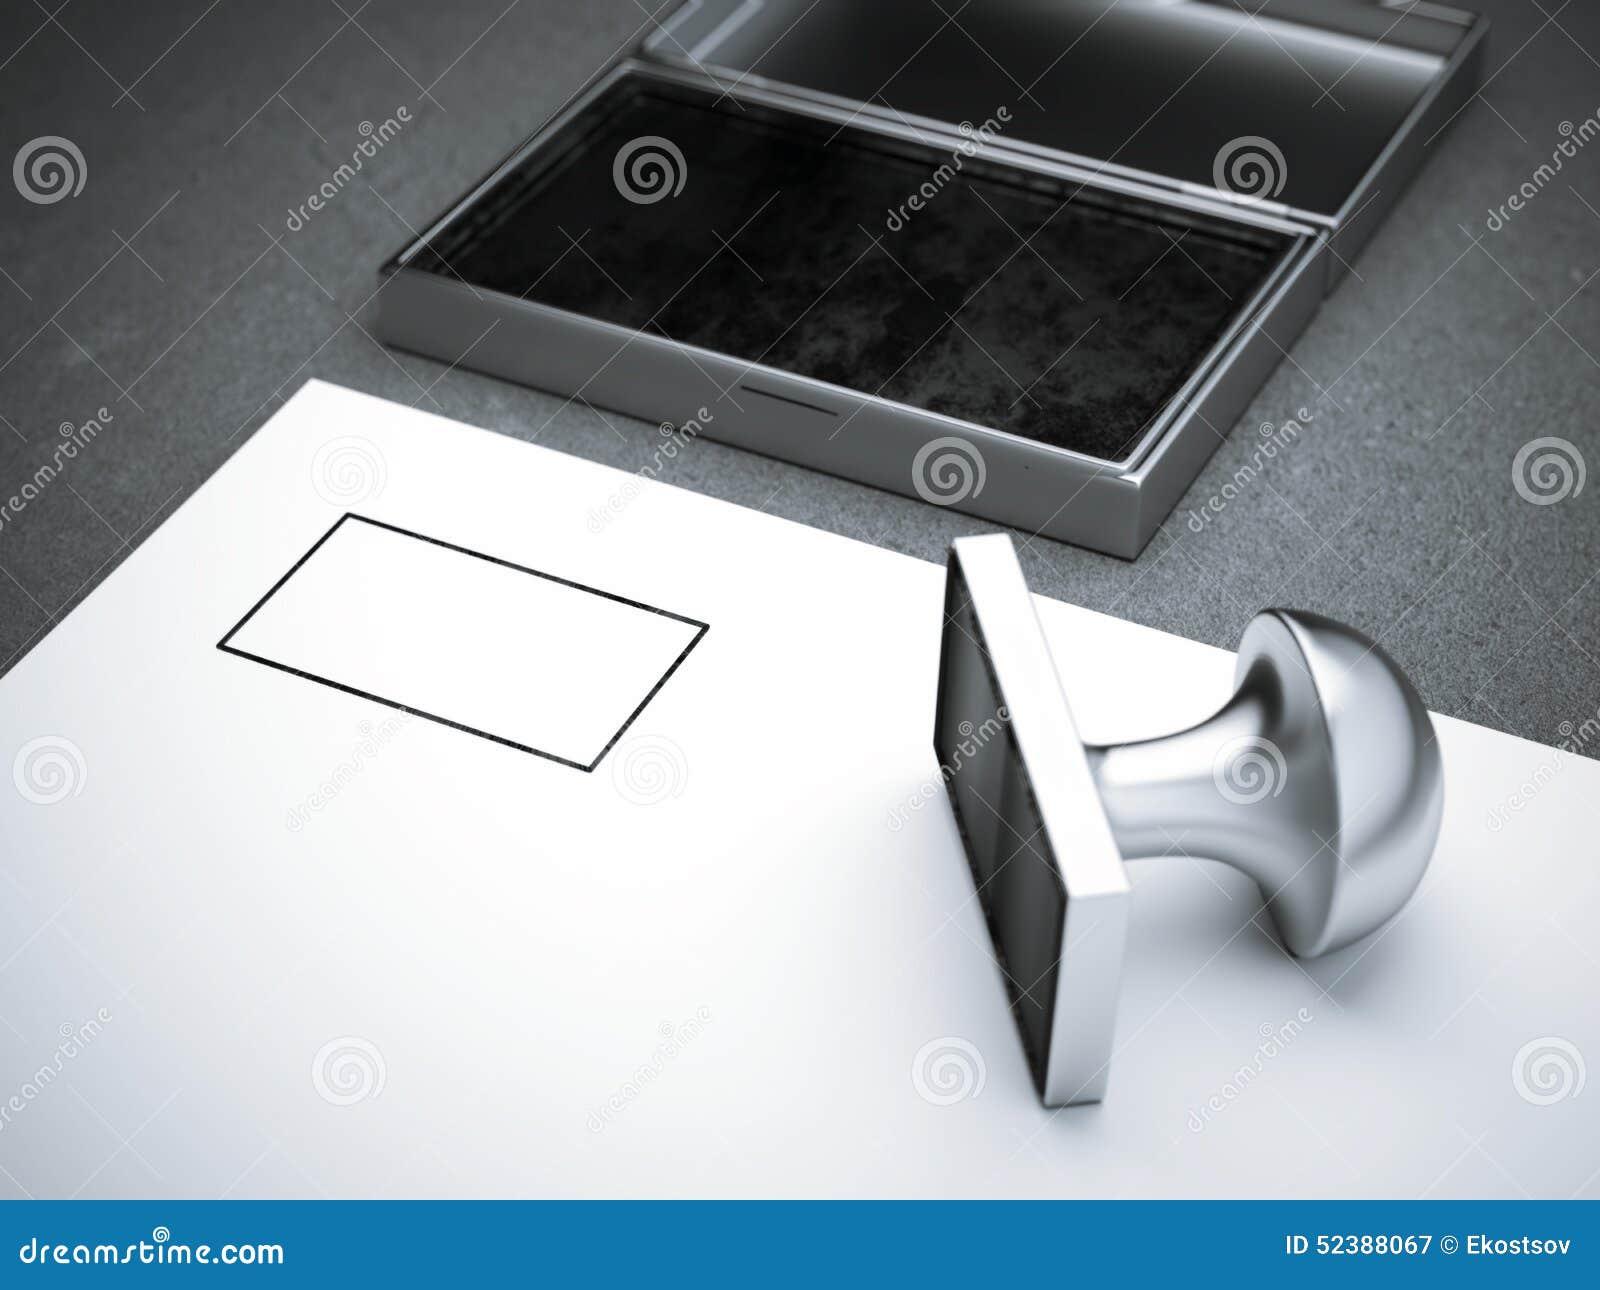 Blank square metal stamp